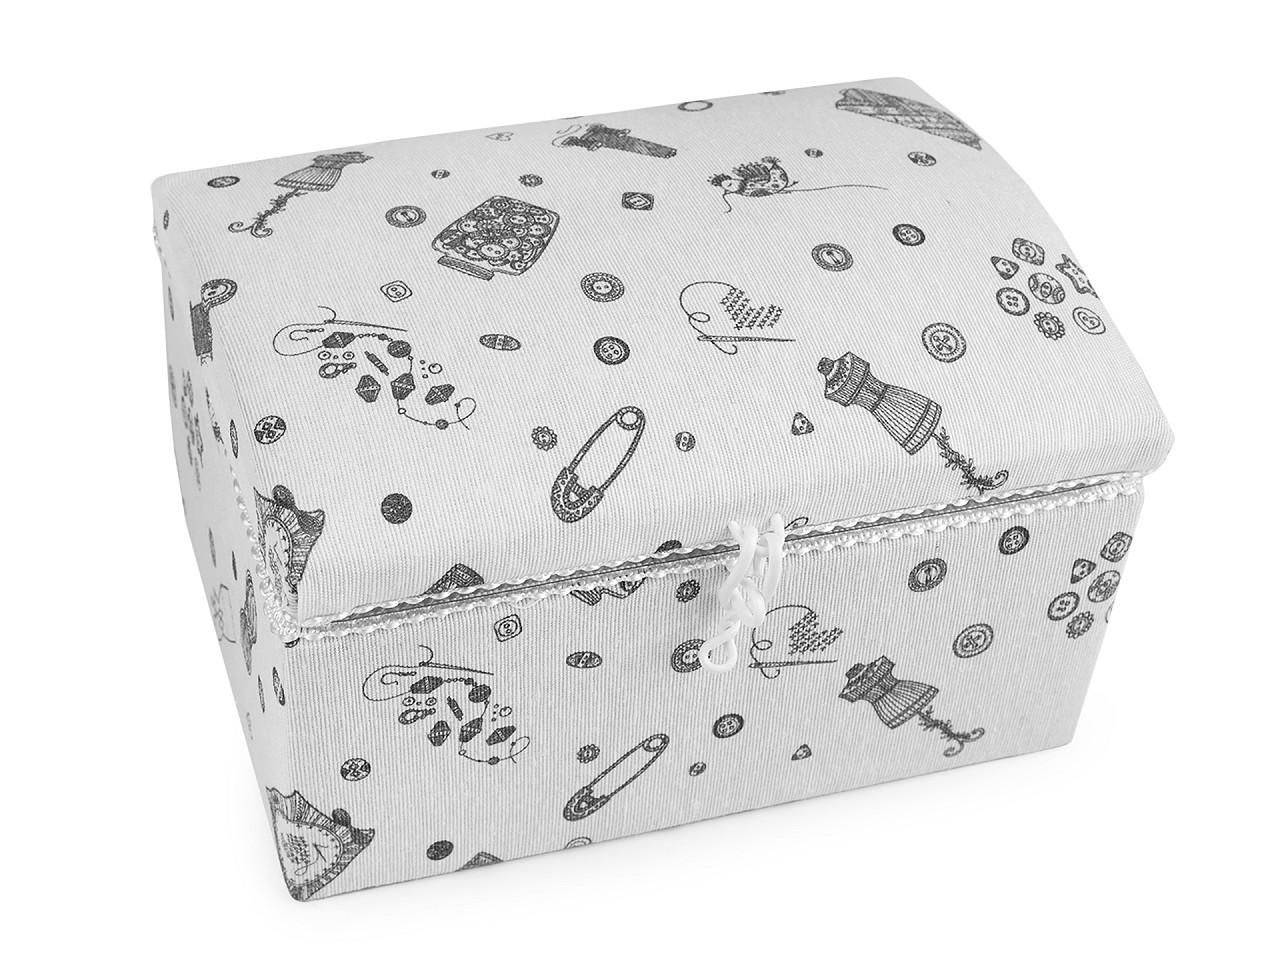 Kazeta / košík na šití čalouněný, barva 34 bílá šedá